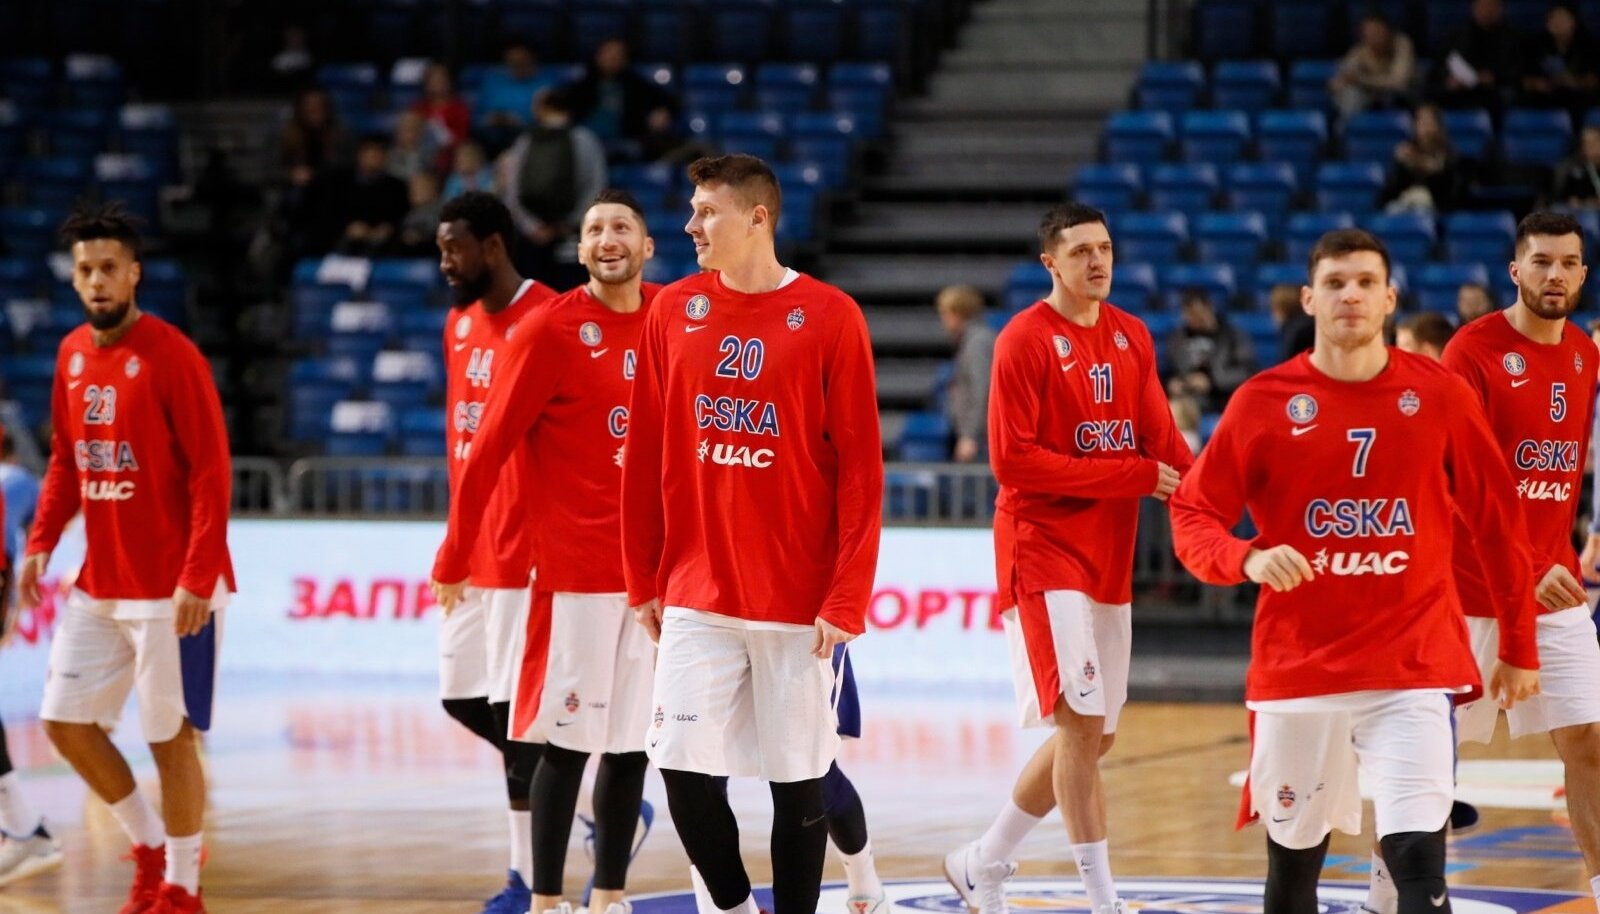 Moskva CSKA mängijad